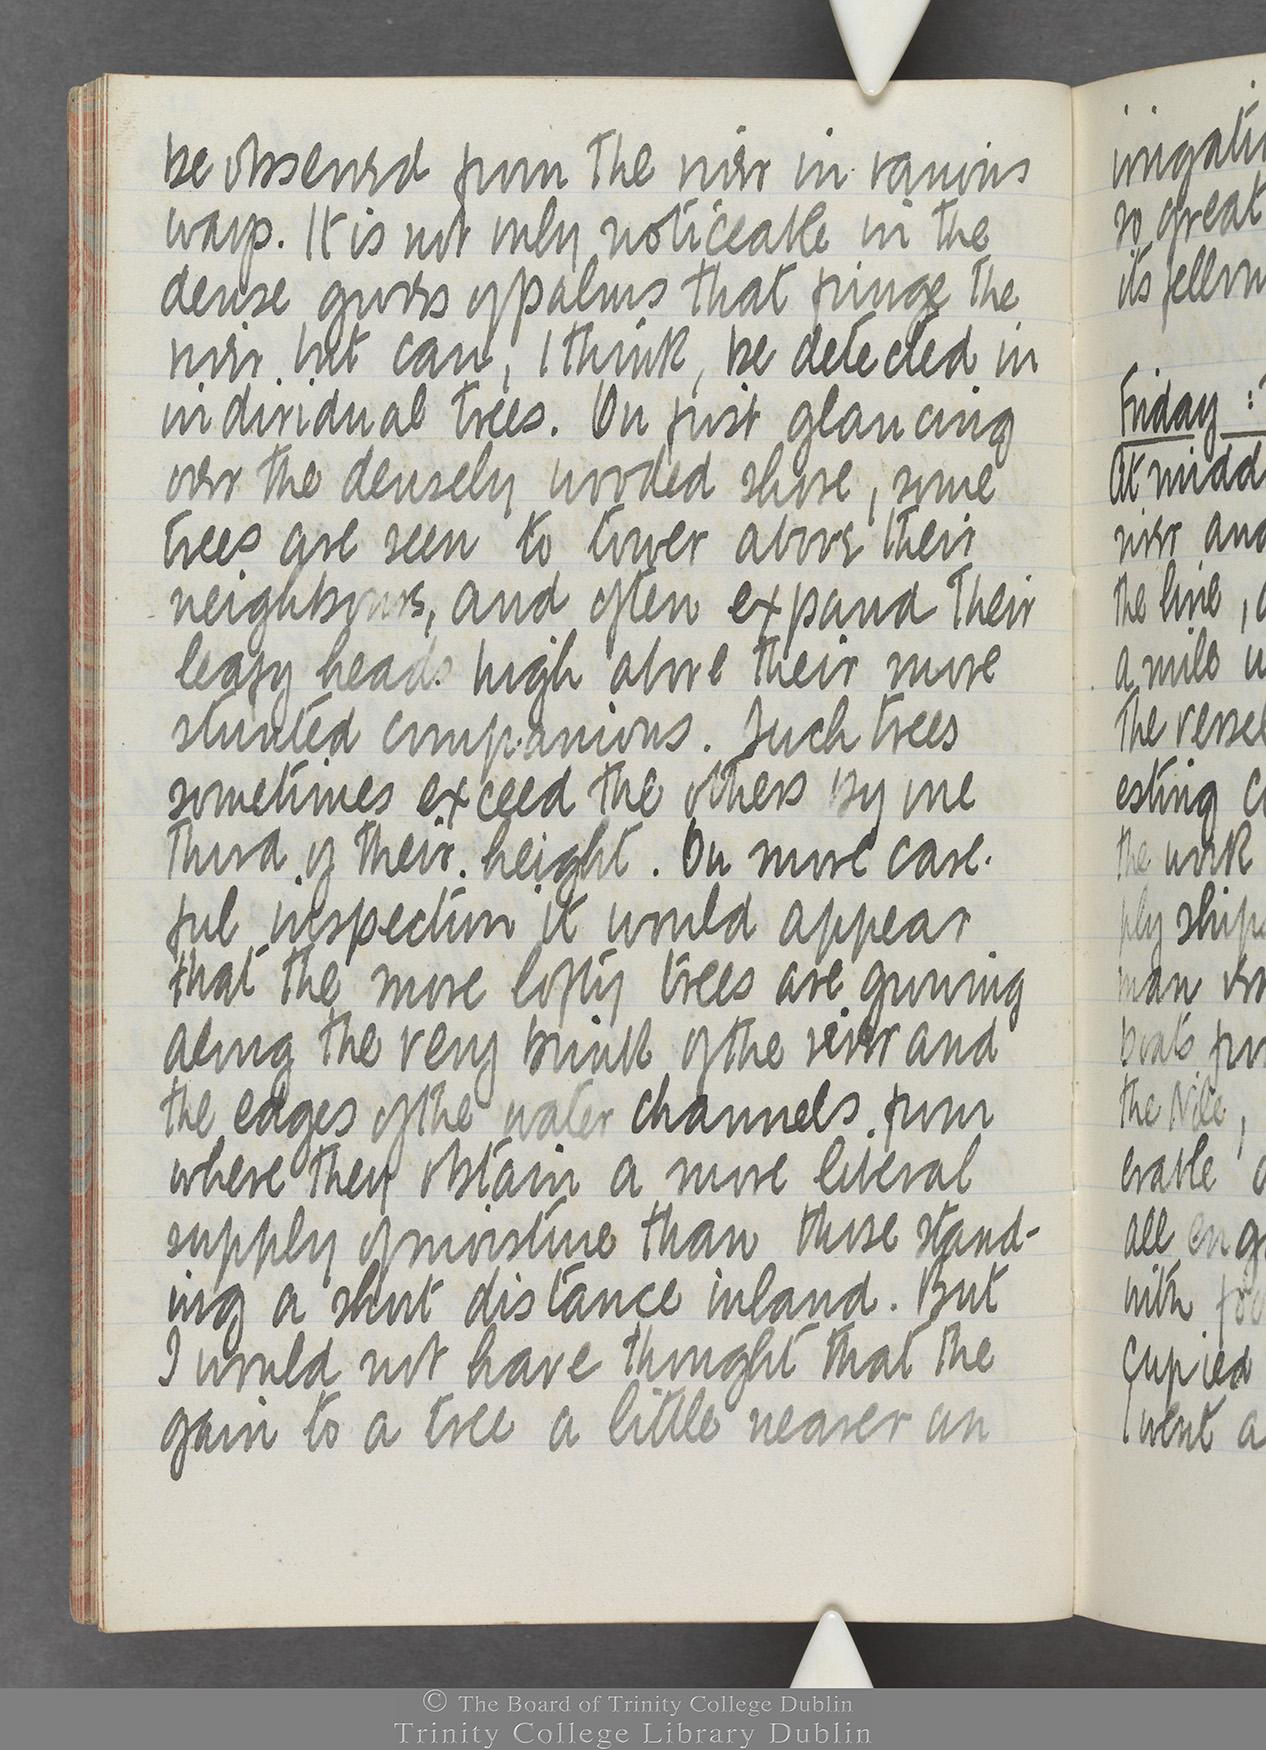 TCD MS 10515 folio 21v